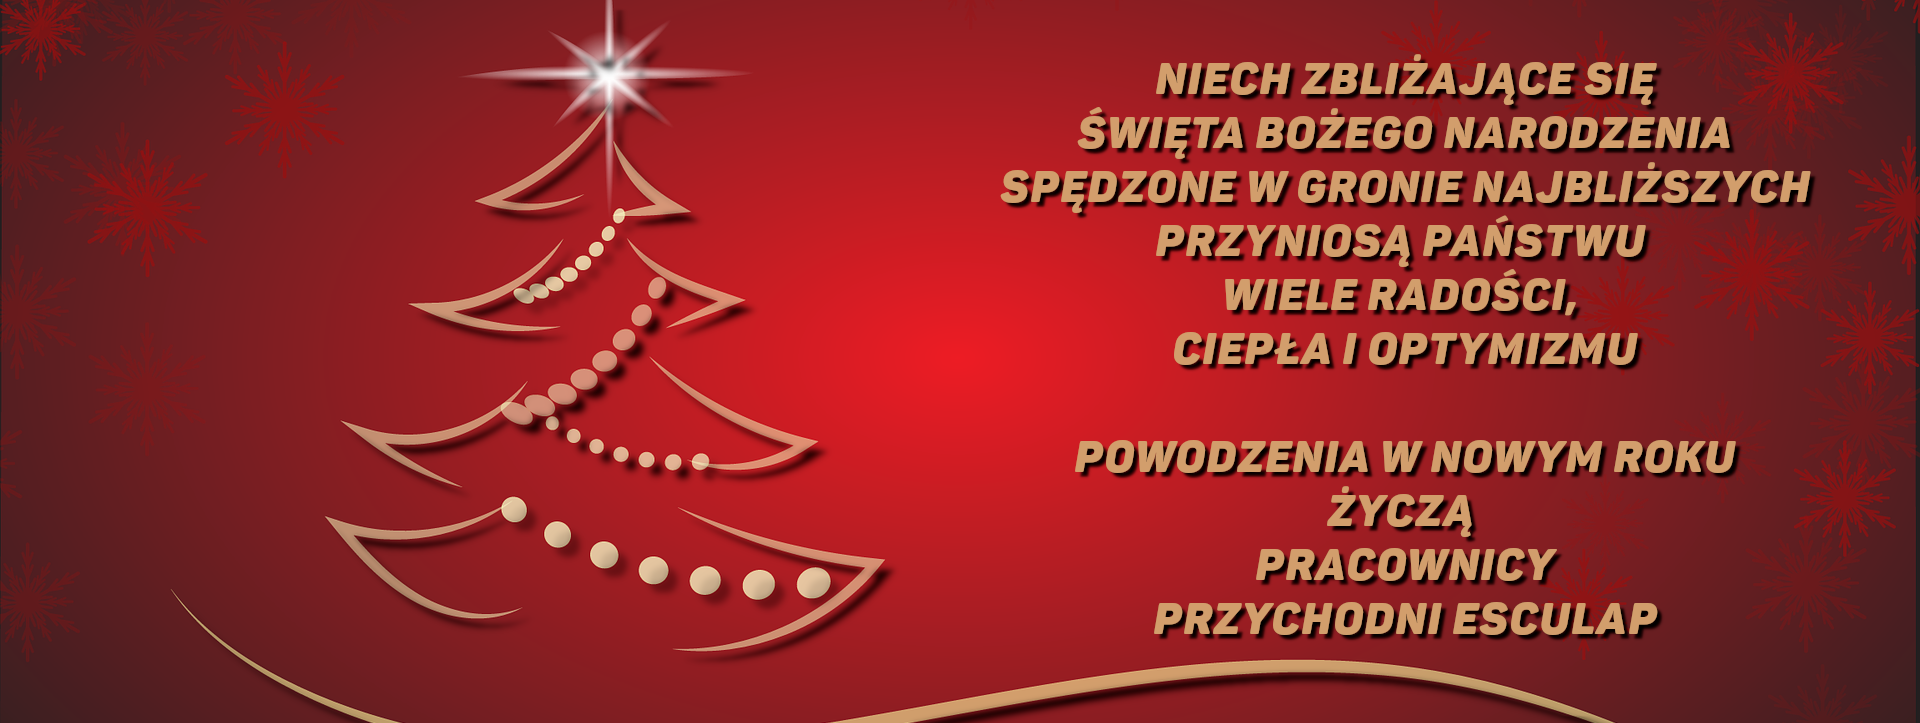 https://esculap-przychodnia.pl/wp-content/uploads/2019/12/Swieta01.png